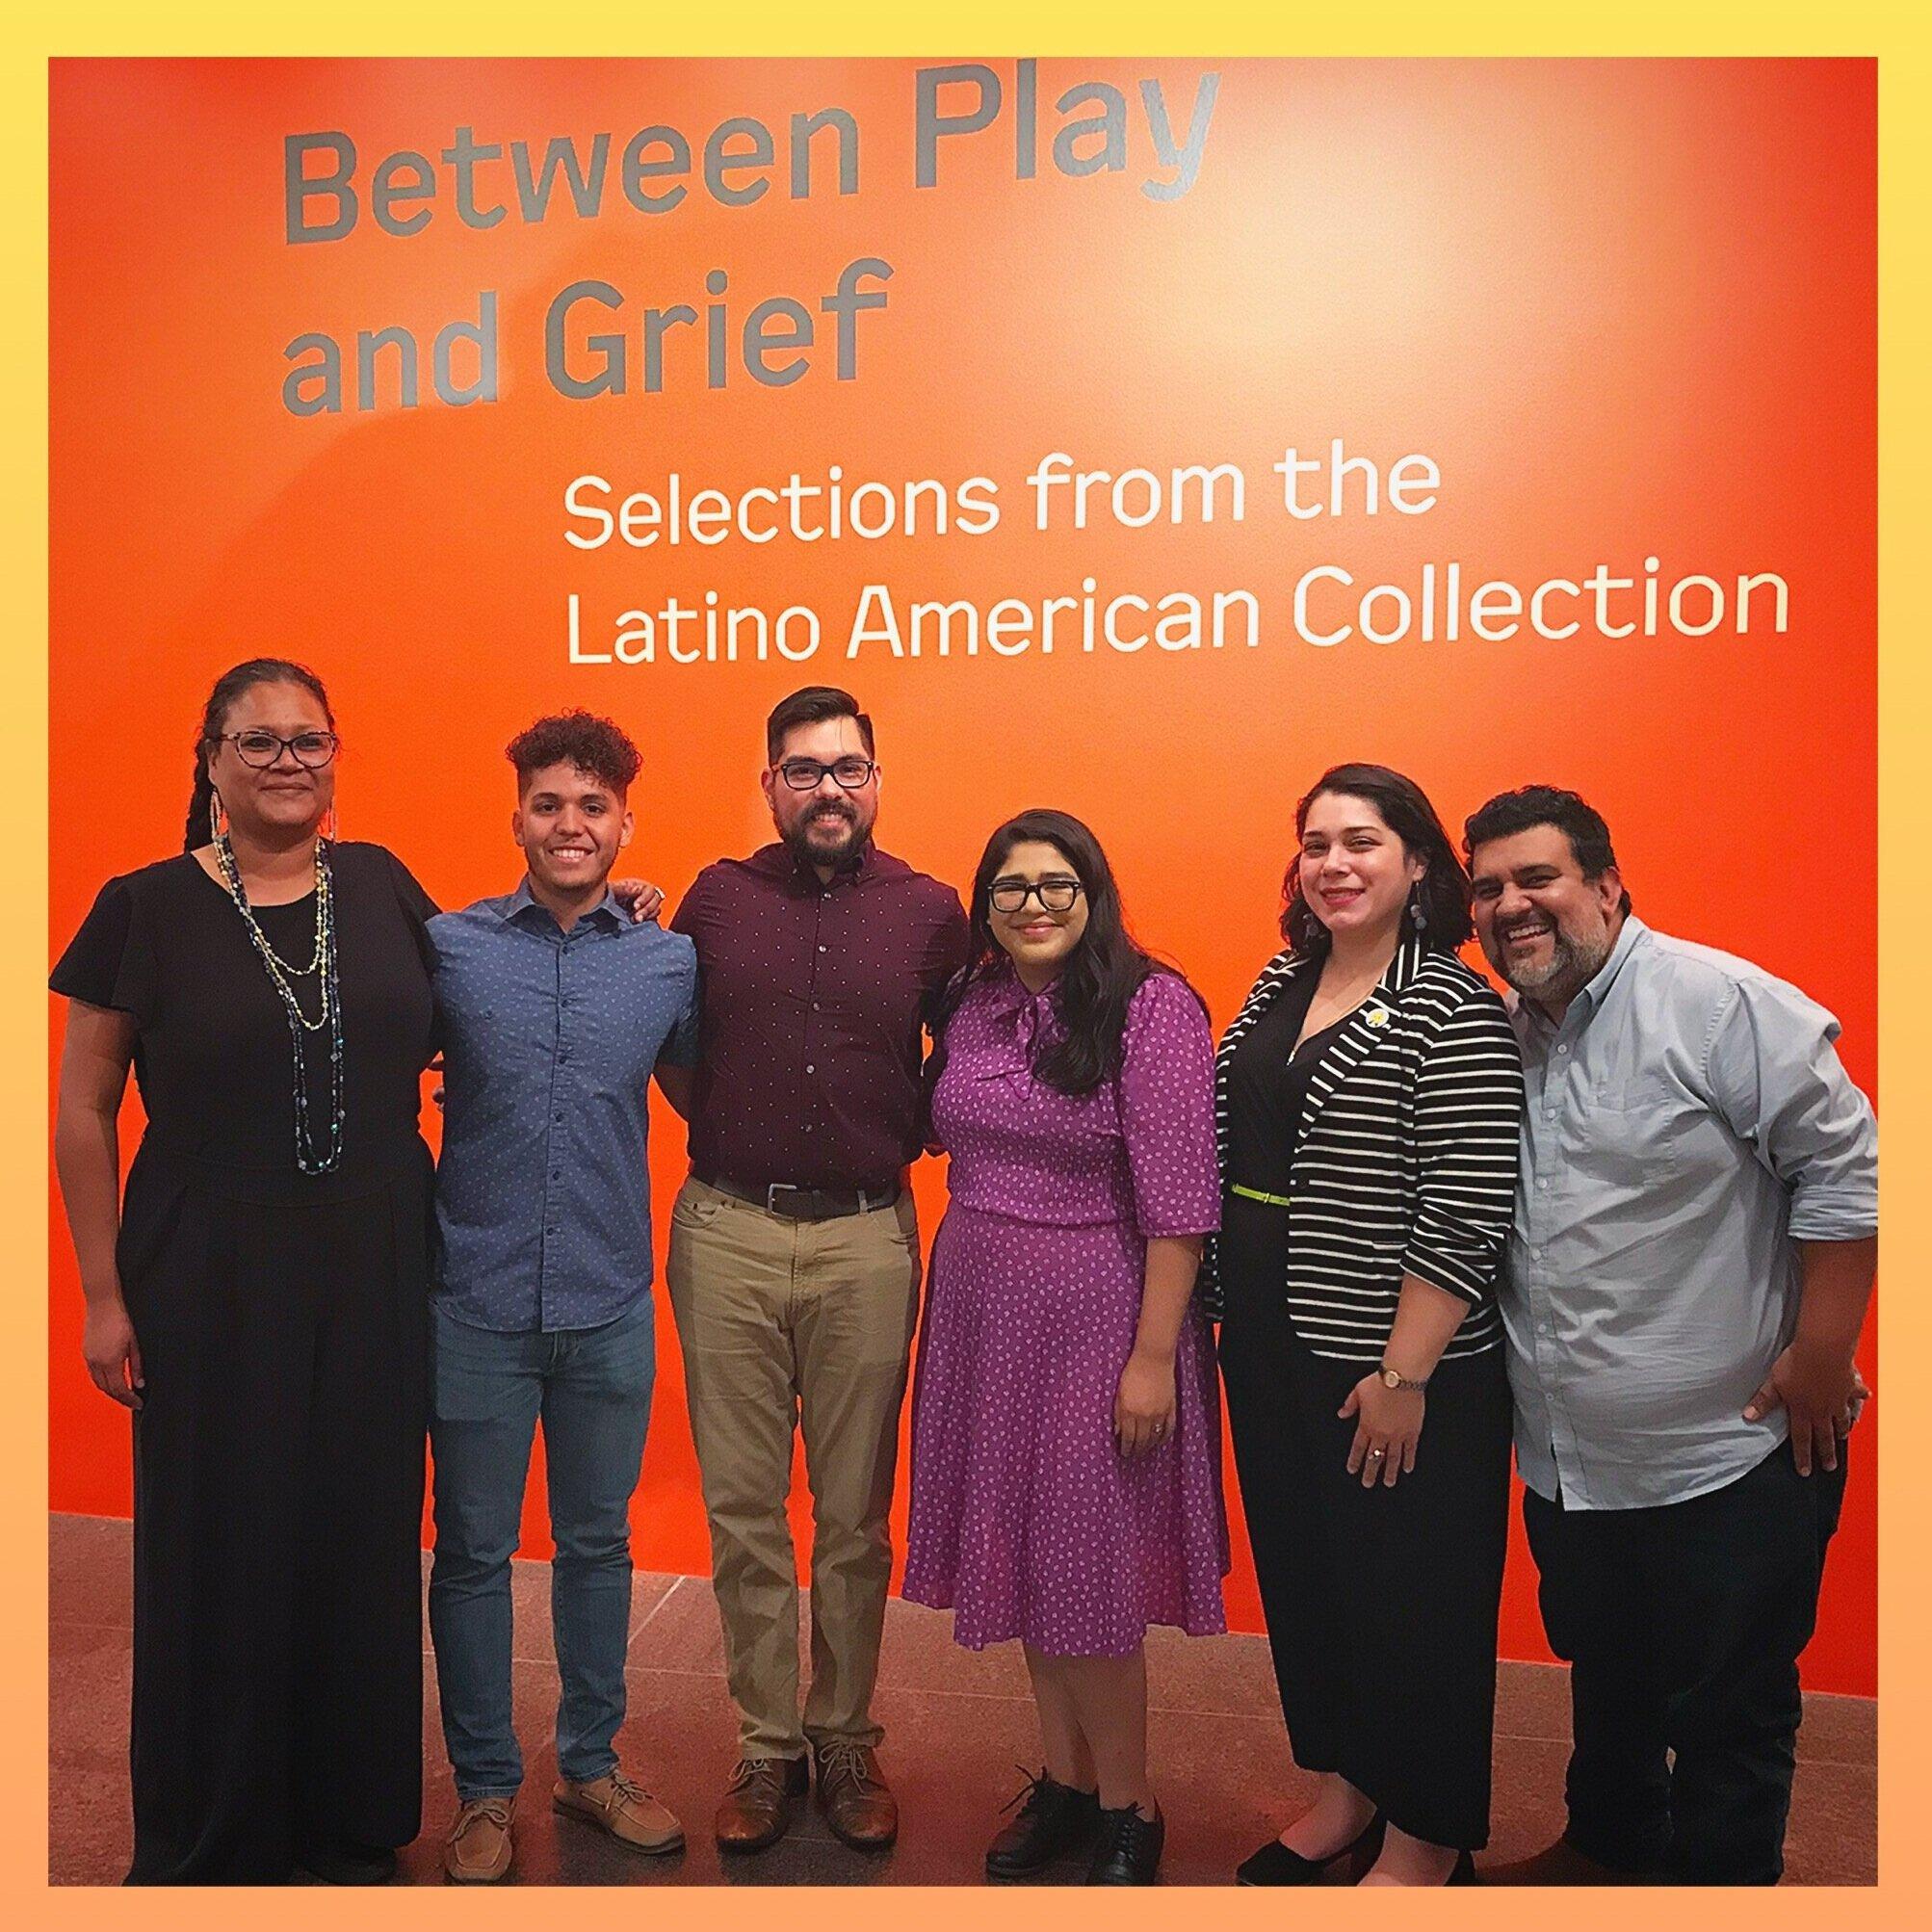 L-R: Natasha Carrizosa, Juan Avalos, Alexander P. Garza, Amanda Ortiz, Yeiry Guevara, Lupe Mendez